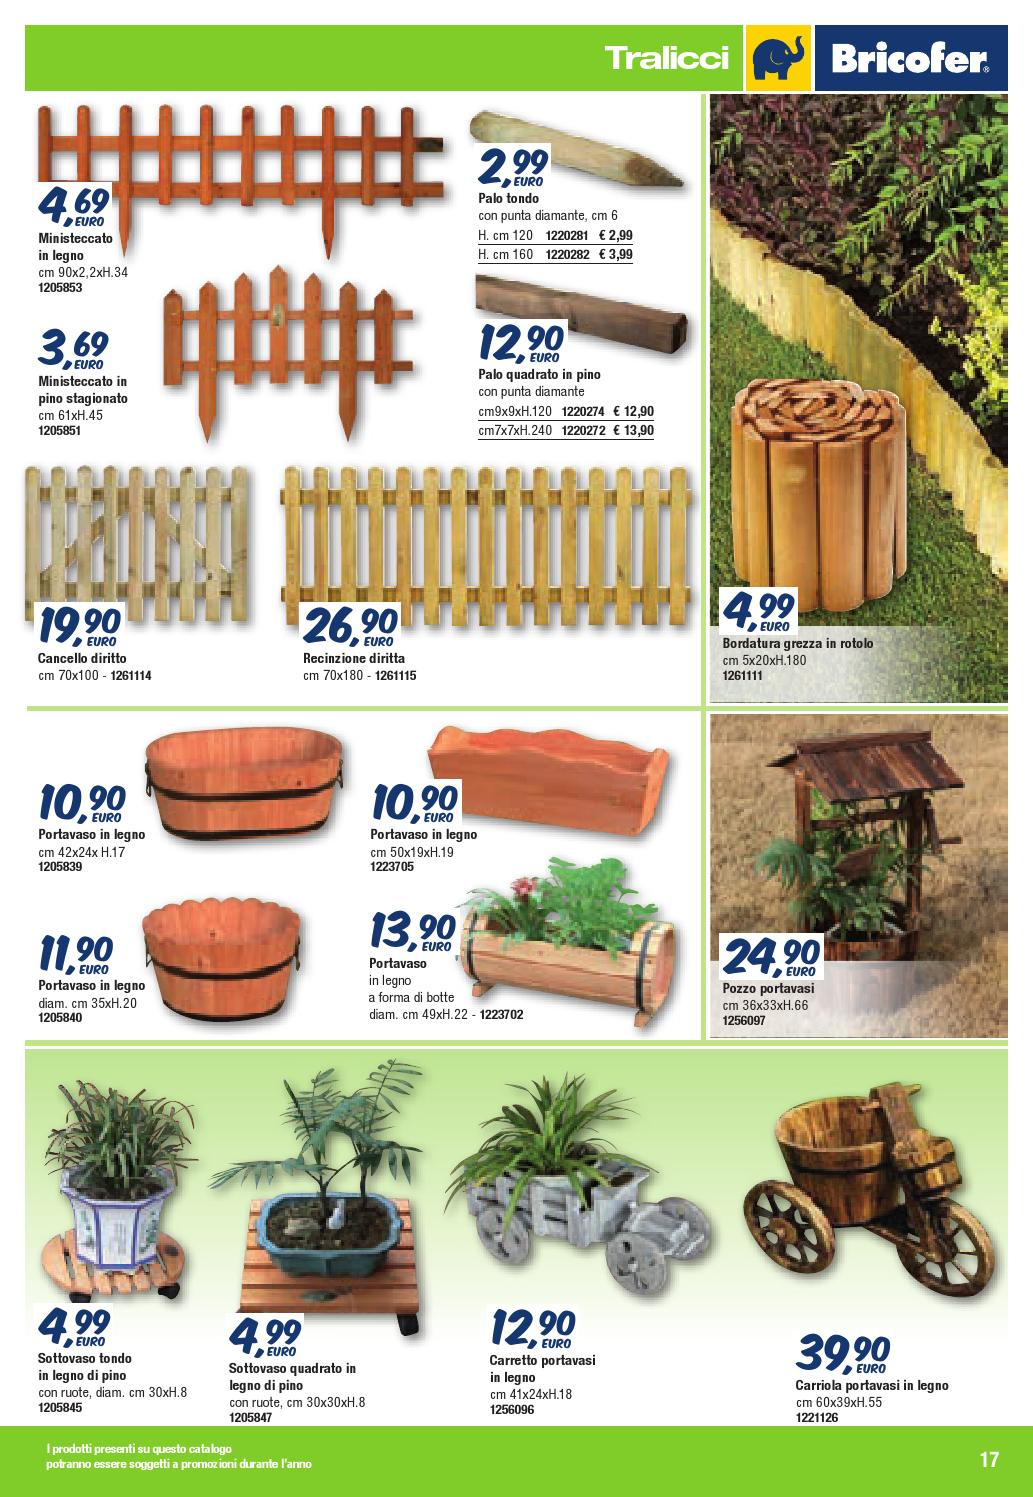 Catalogo giardino 2014 web by bricofer italia spa page 17 for Catalogo bricofer